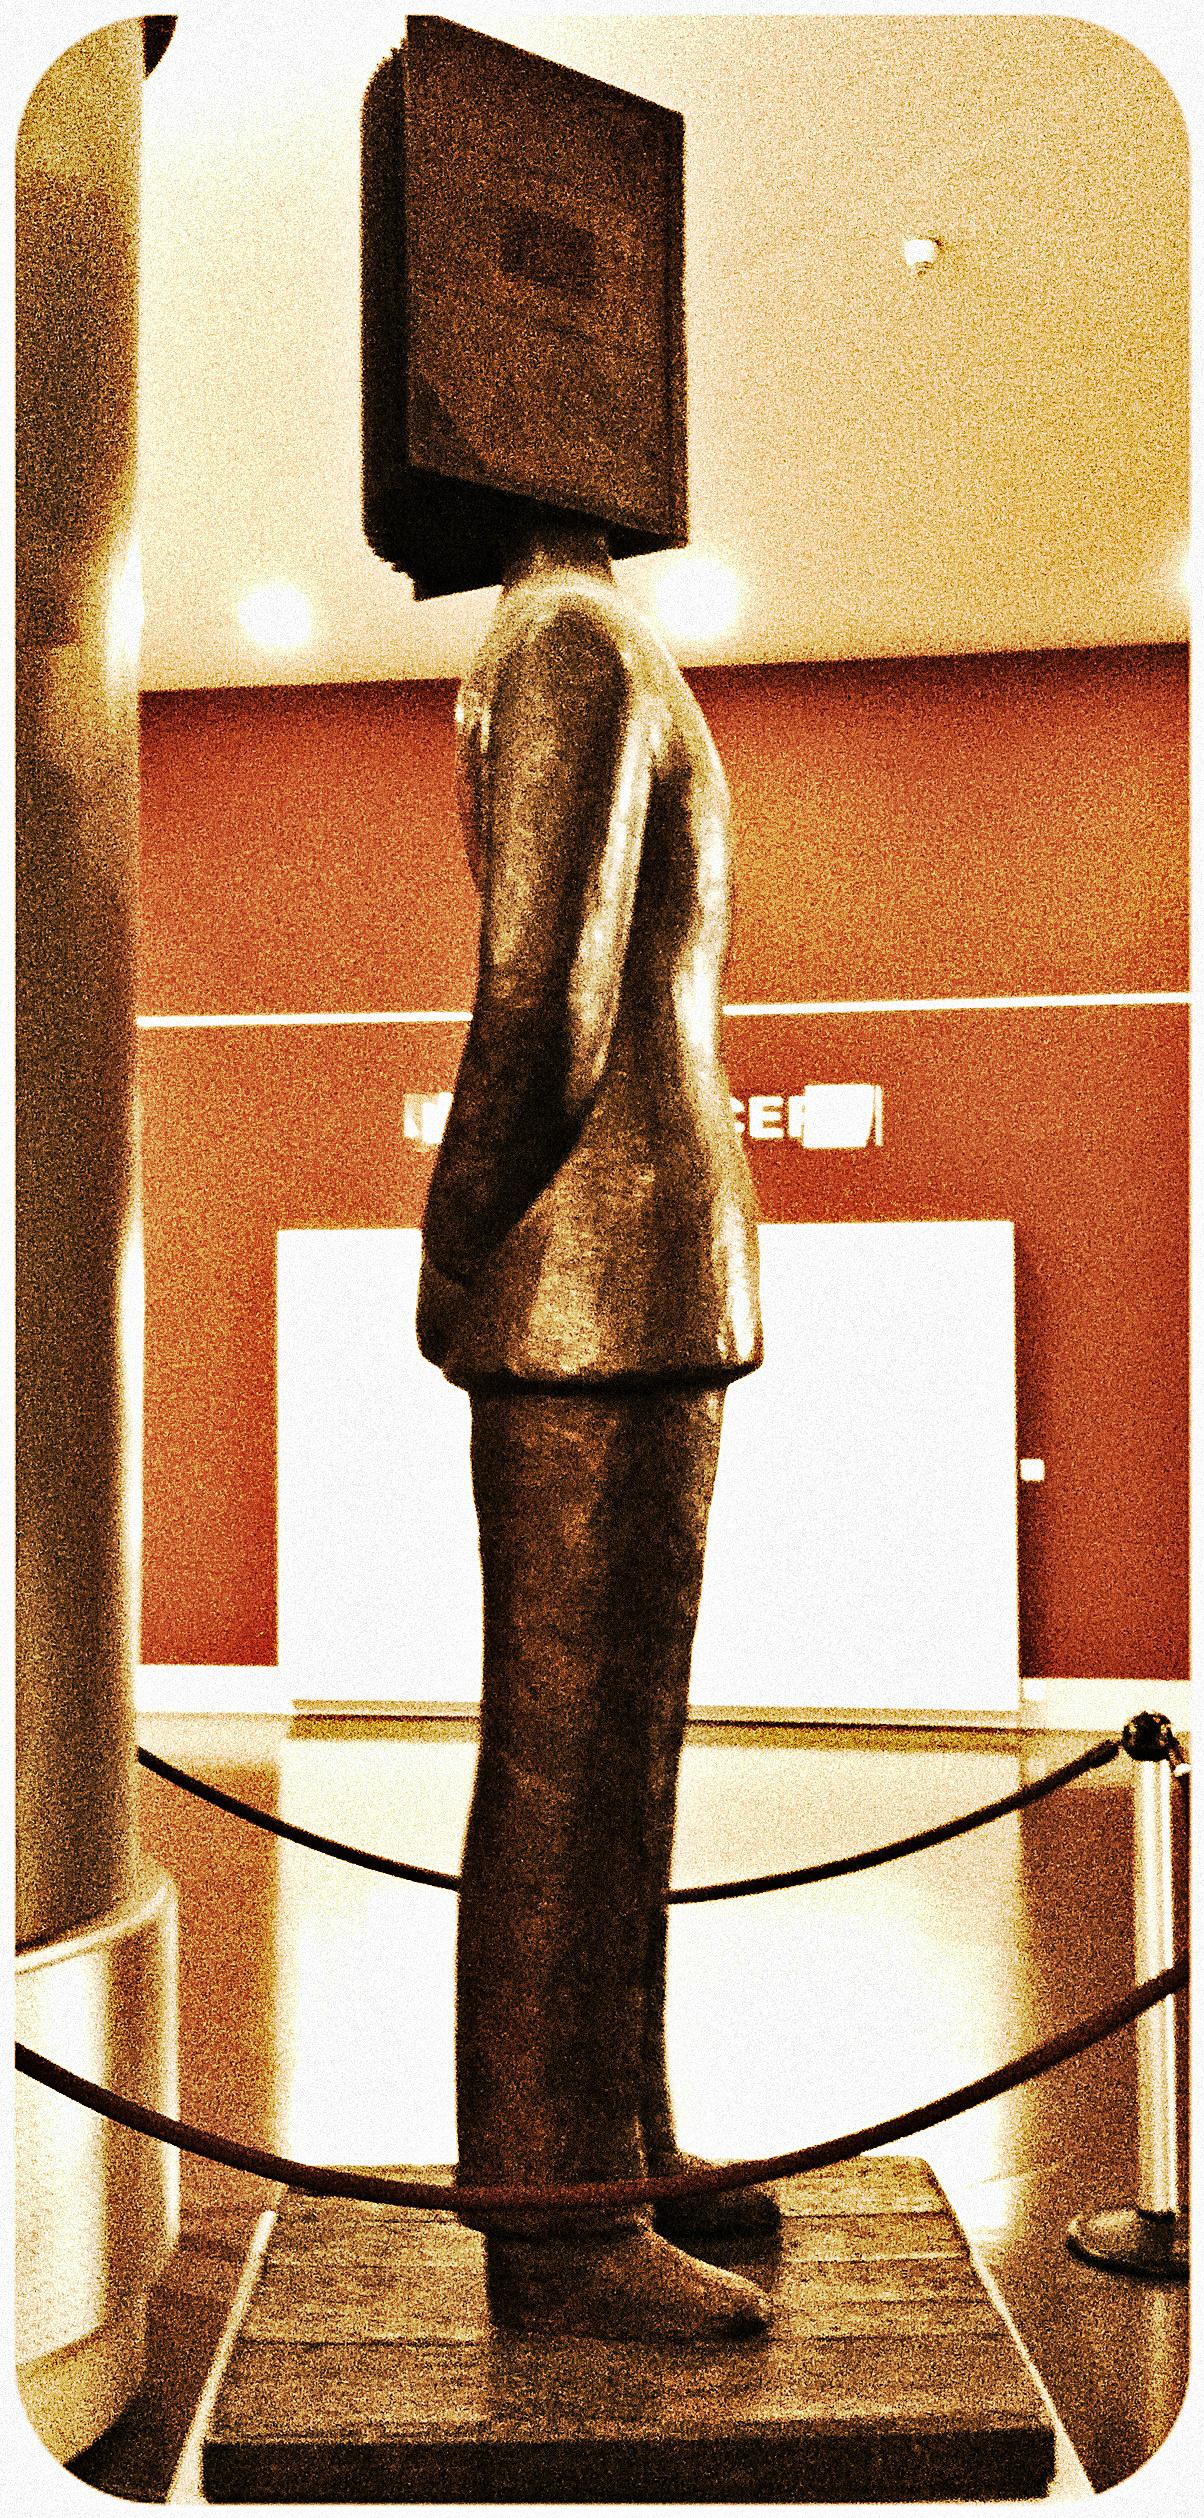 bookhead sculpture, nice france, sosno, library